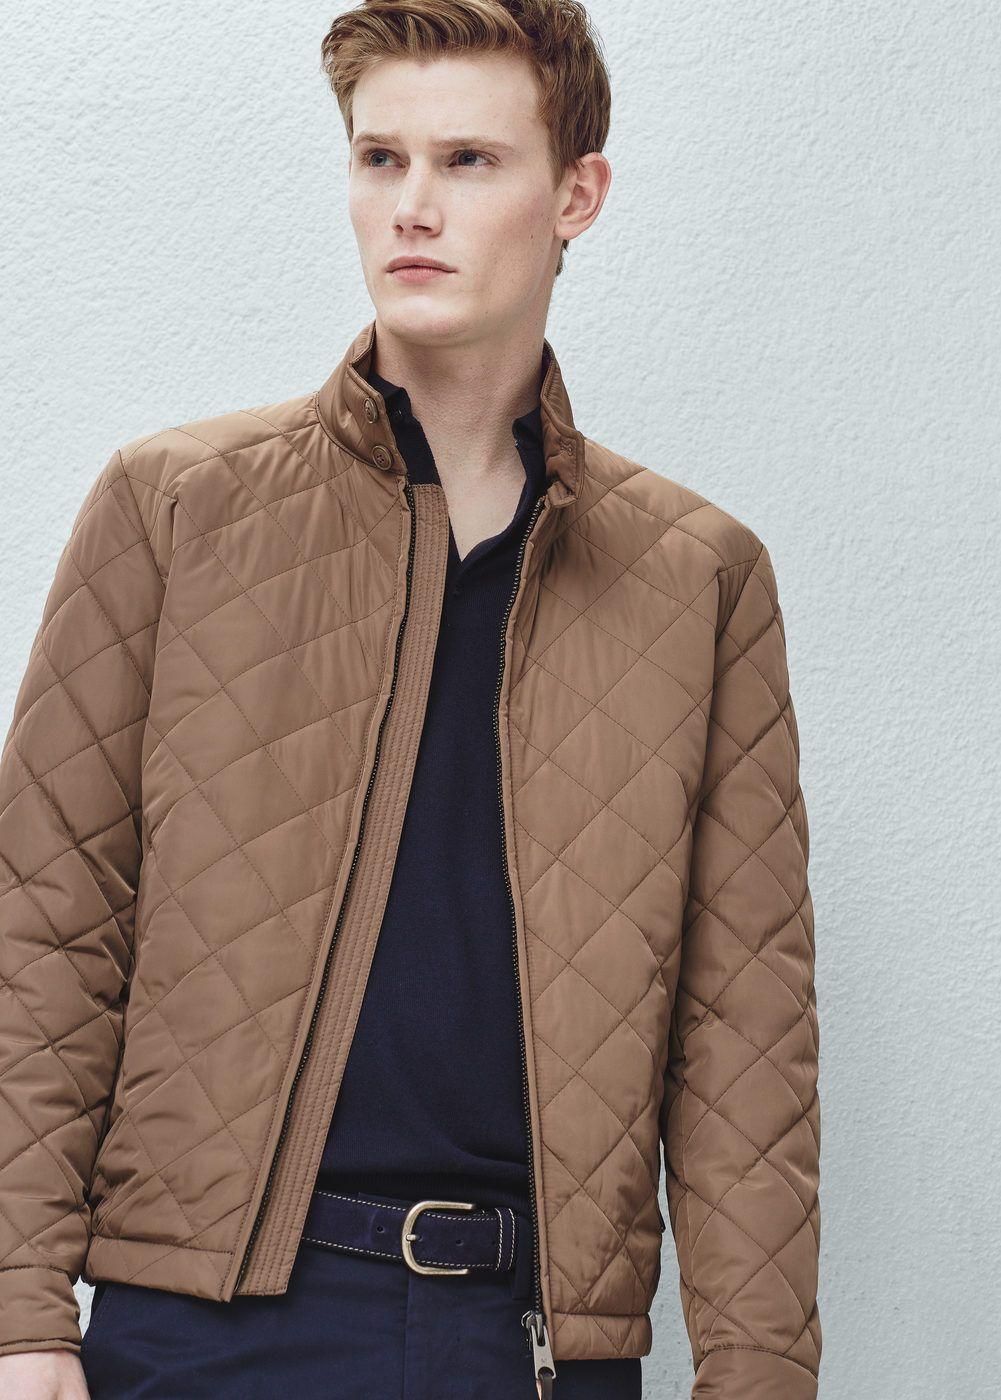 Pocket Quilted Jacket Men Mango Man United Kingdom Mens Jackets Mens Outdoor Jackets Men S Coats And Jackets [ 1400 x 1001 Pixel ]